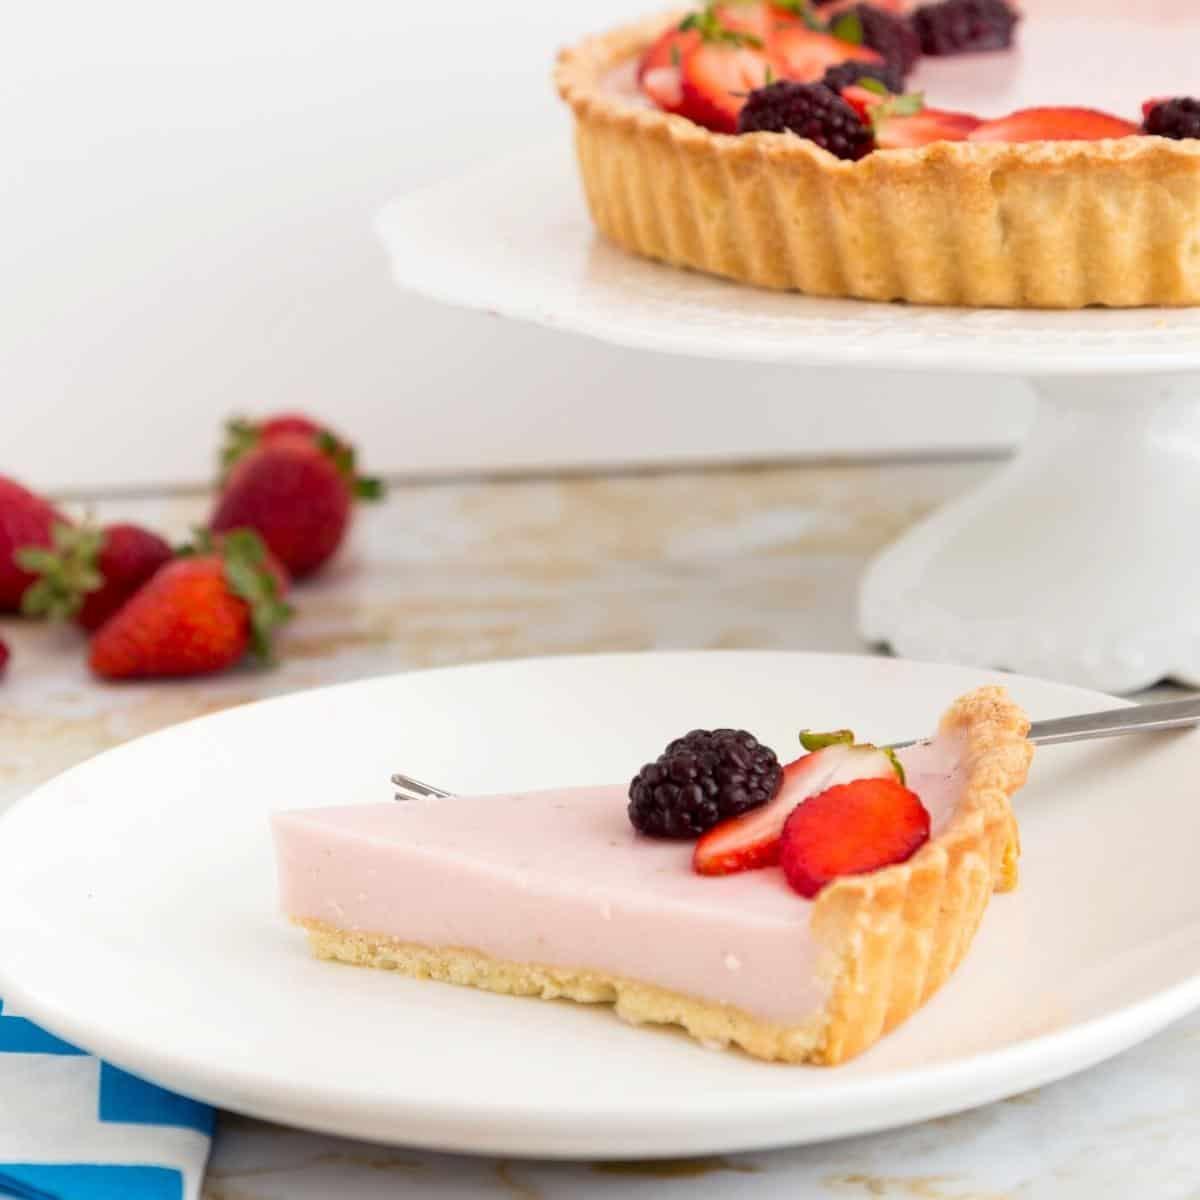 A slice tart on a cake stand